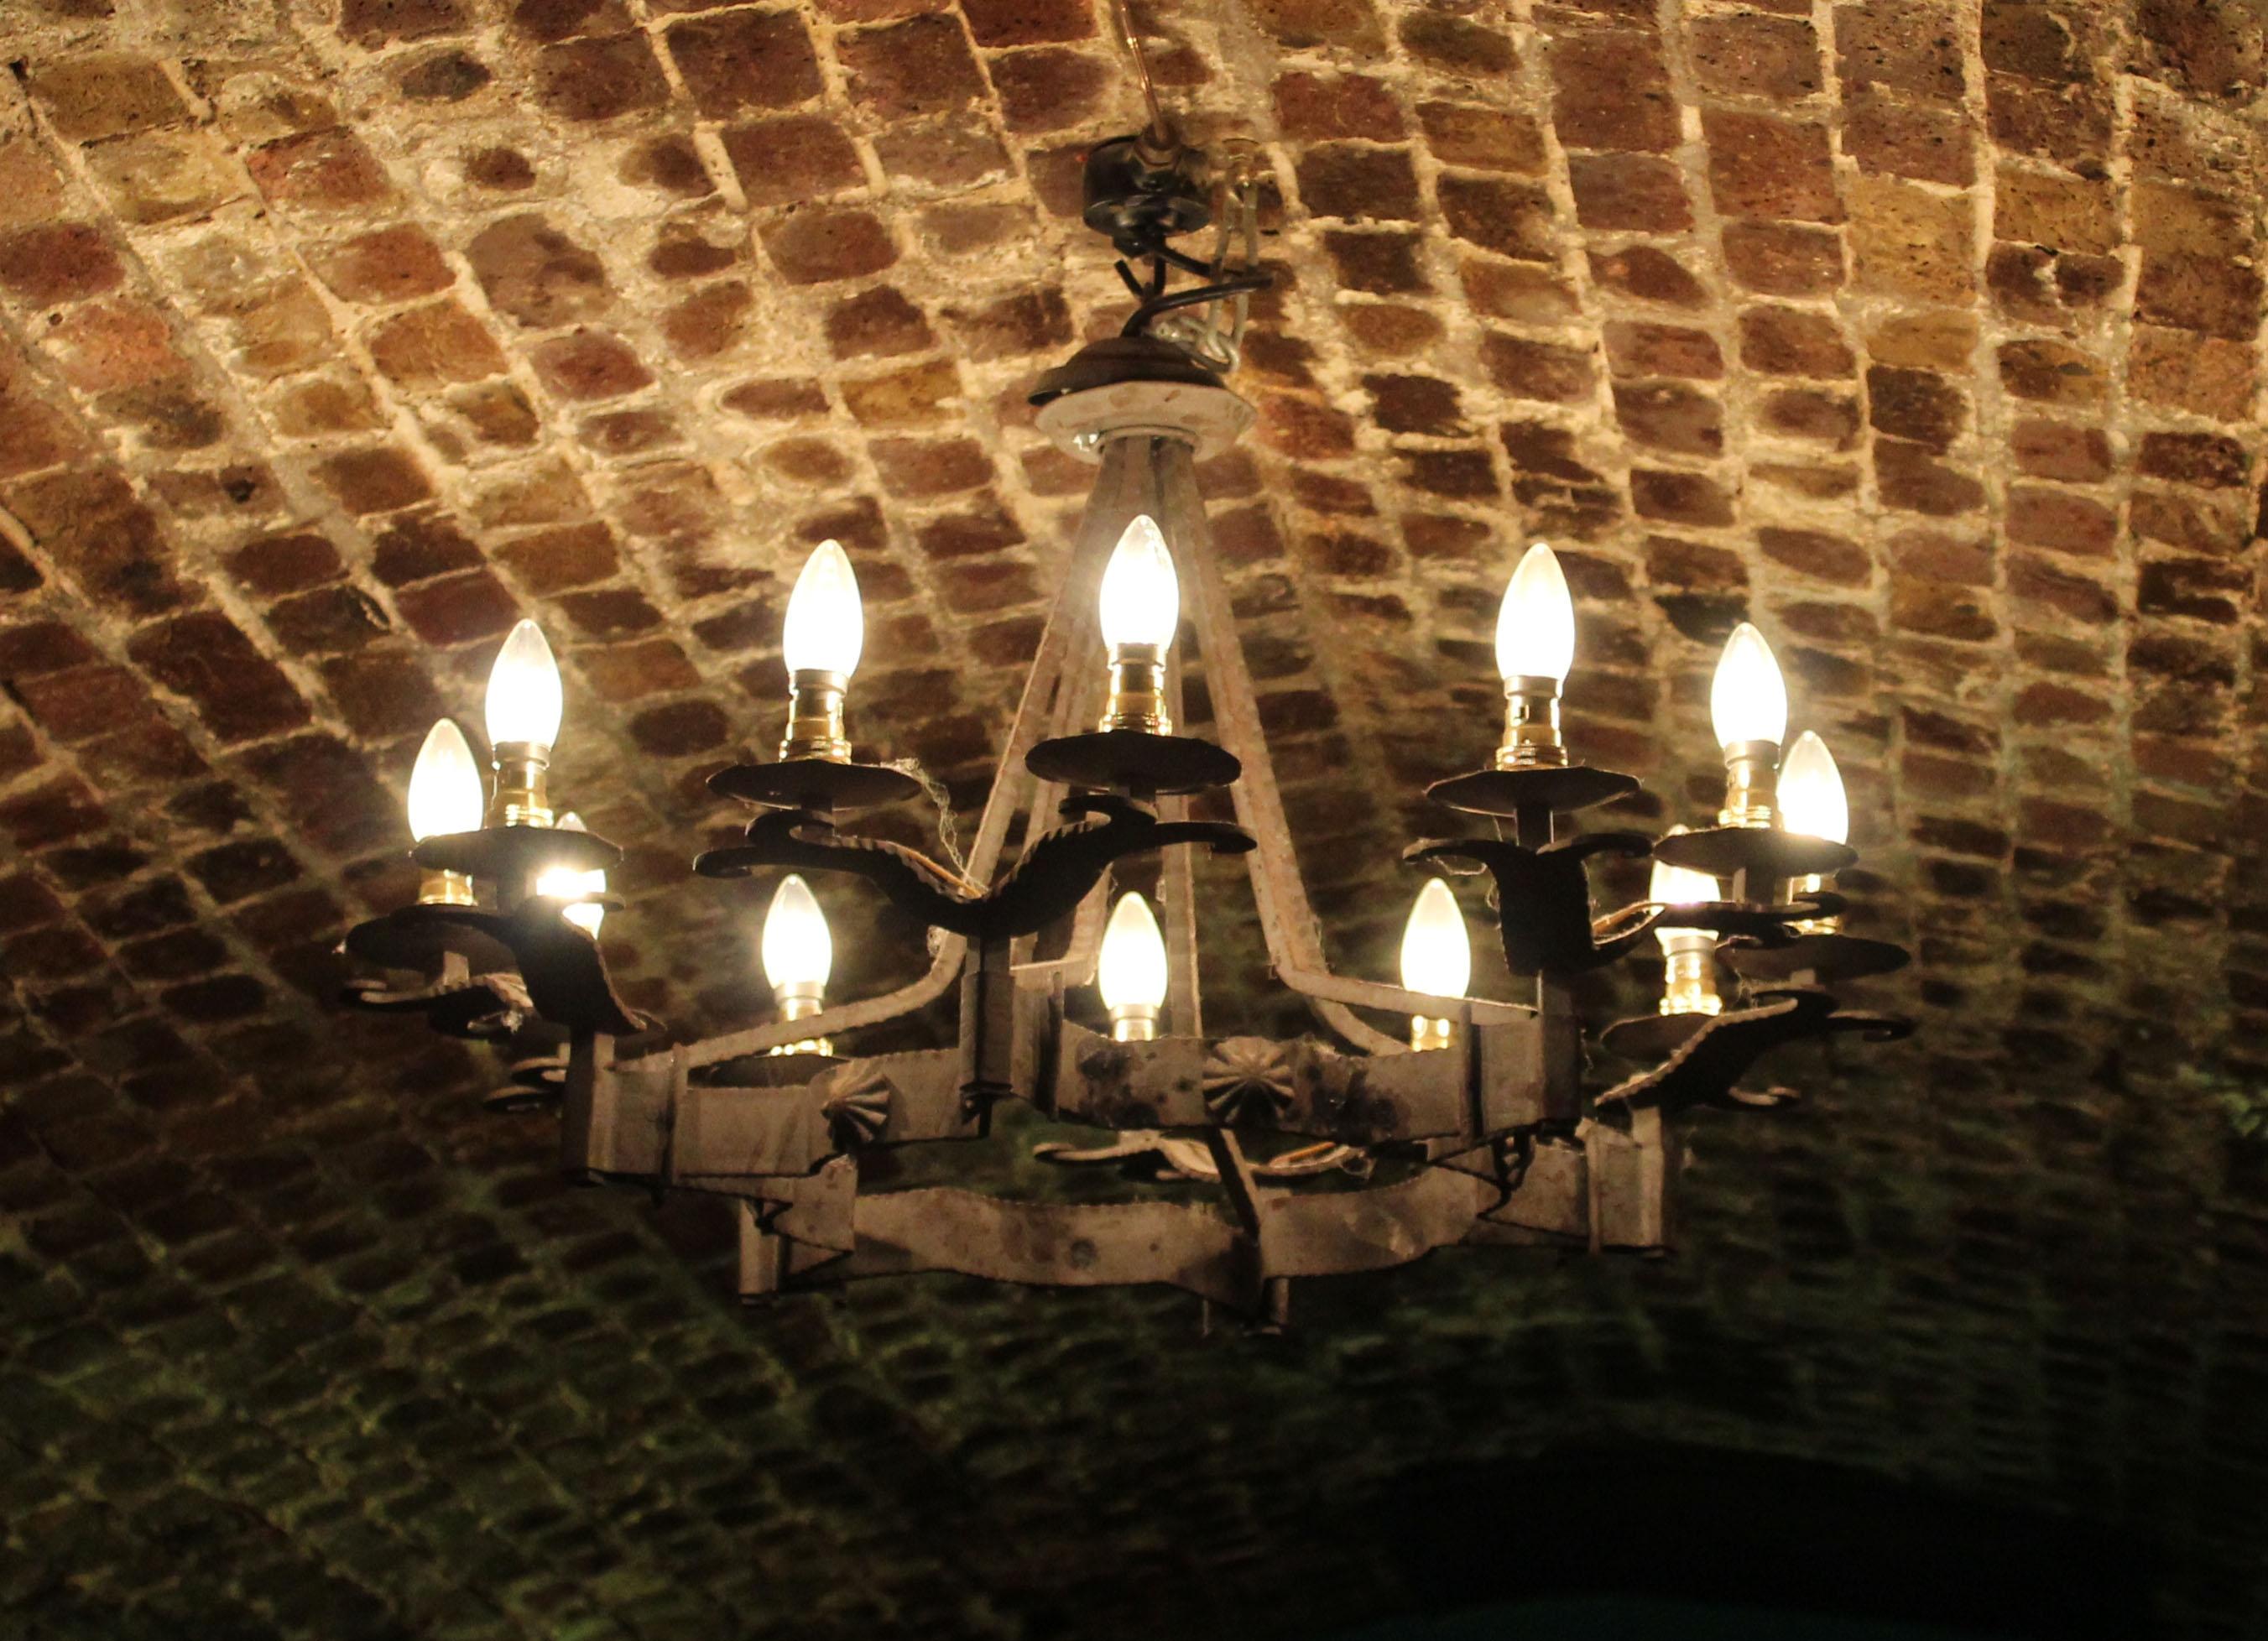 medieval banquet london (17)